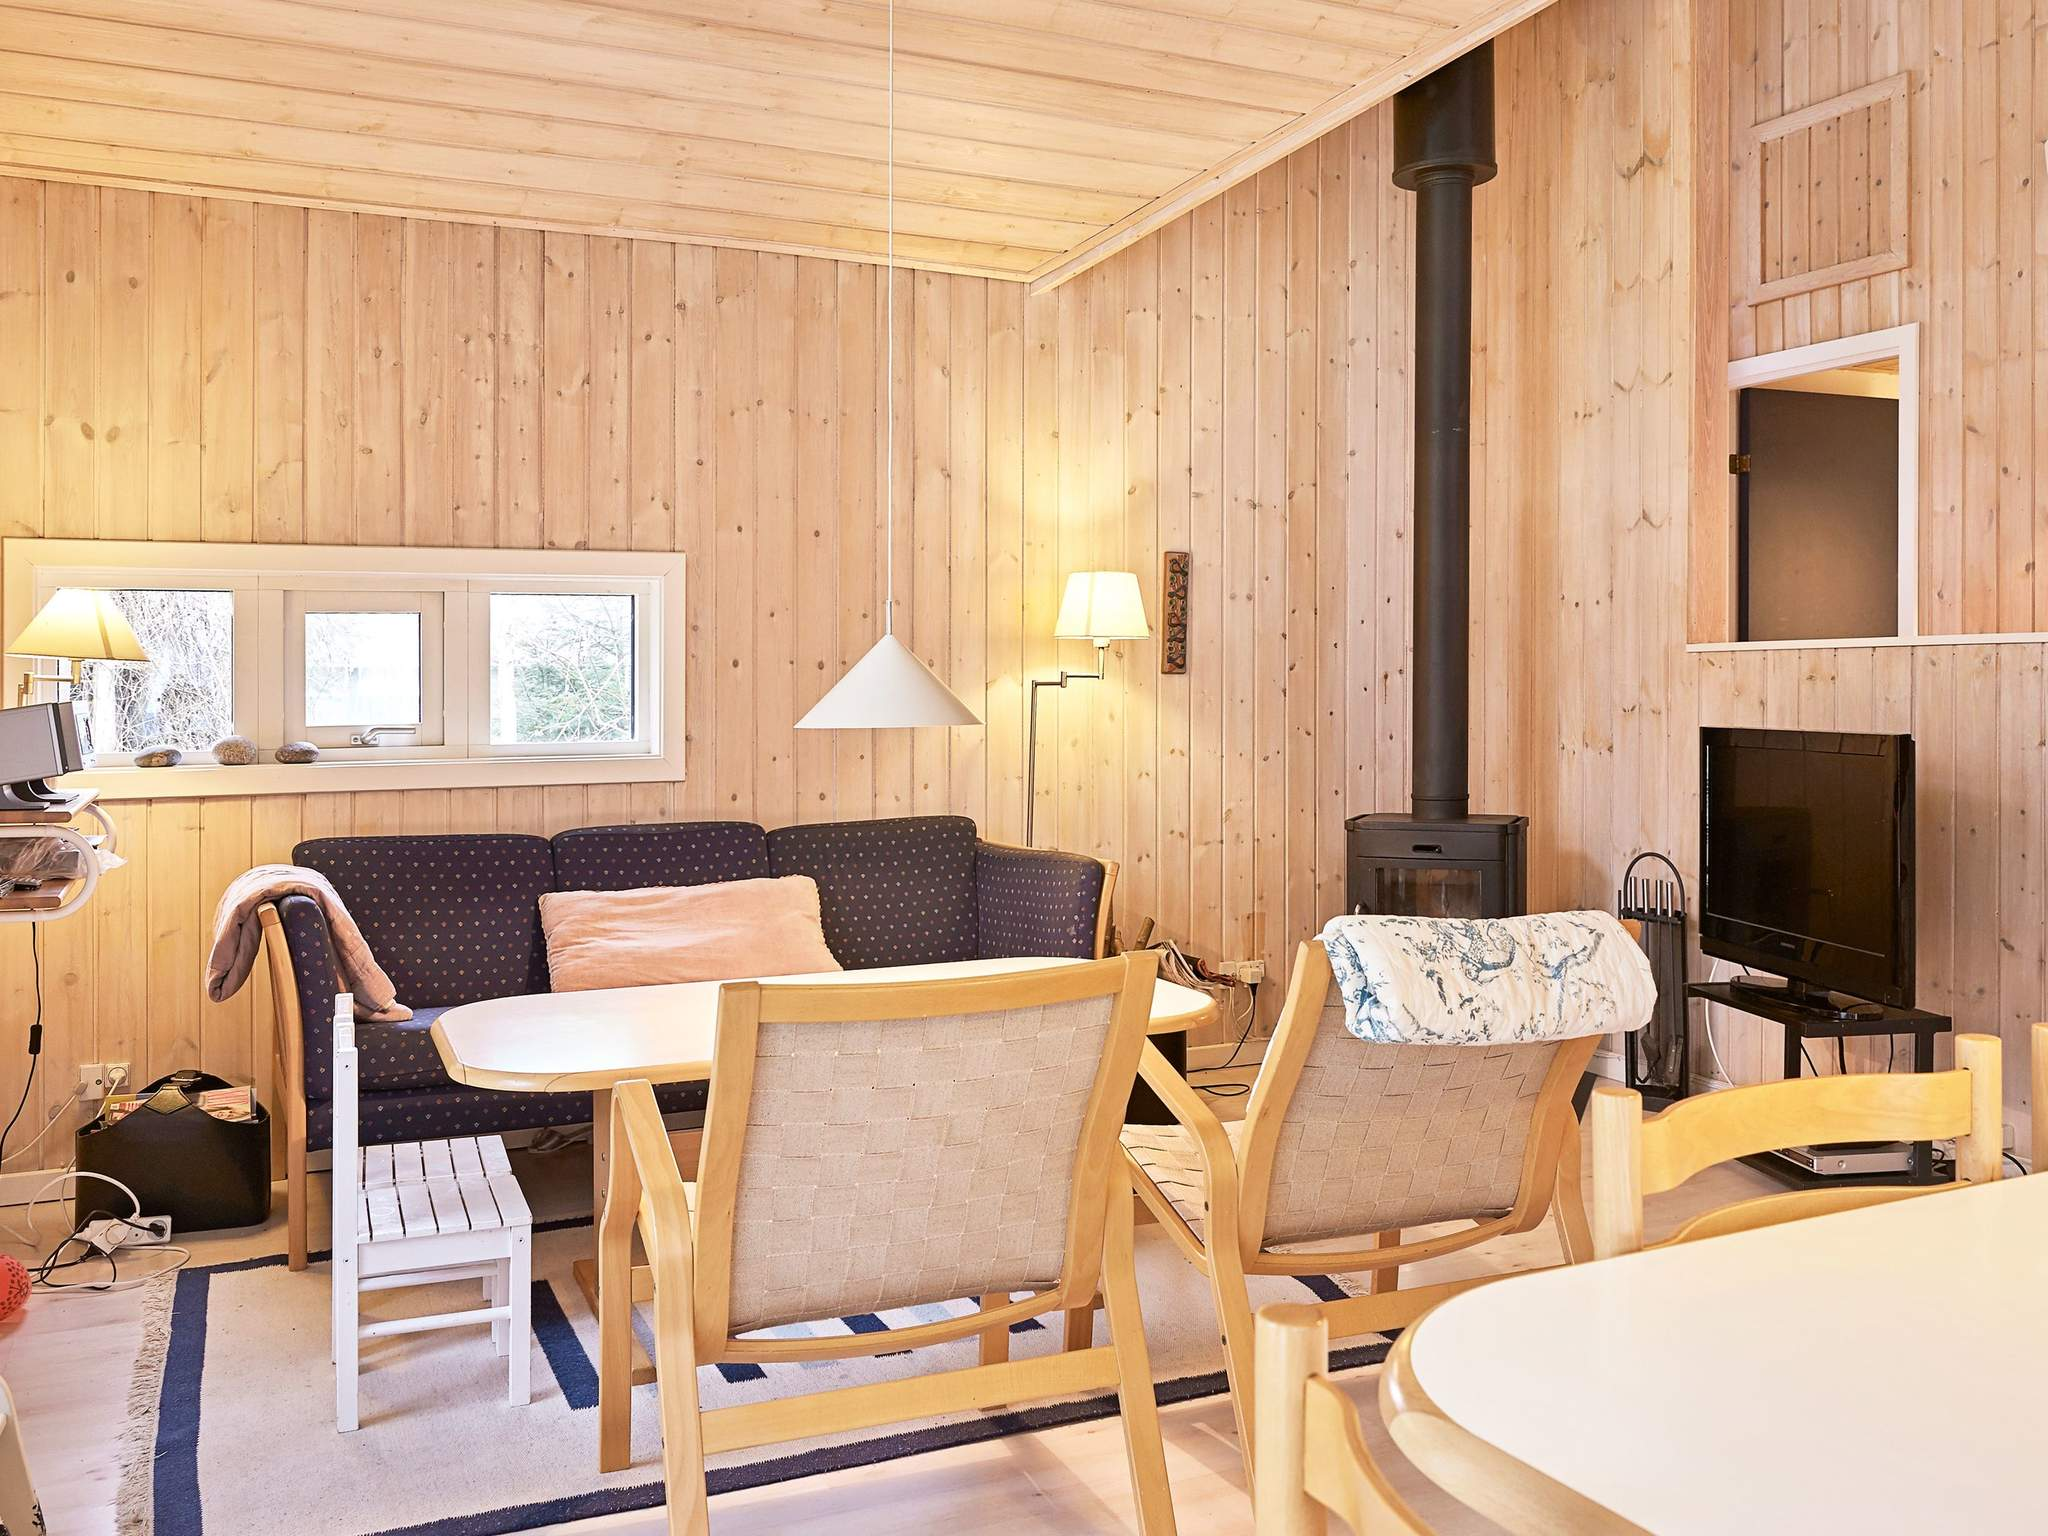 Maison de vacances Østre Sømarken (82542), Aakirkeby, , Bornholm, Danemark, image 2